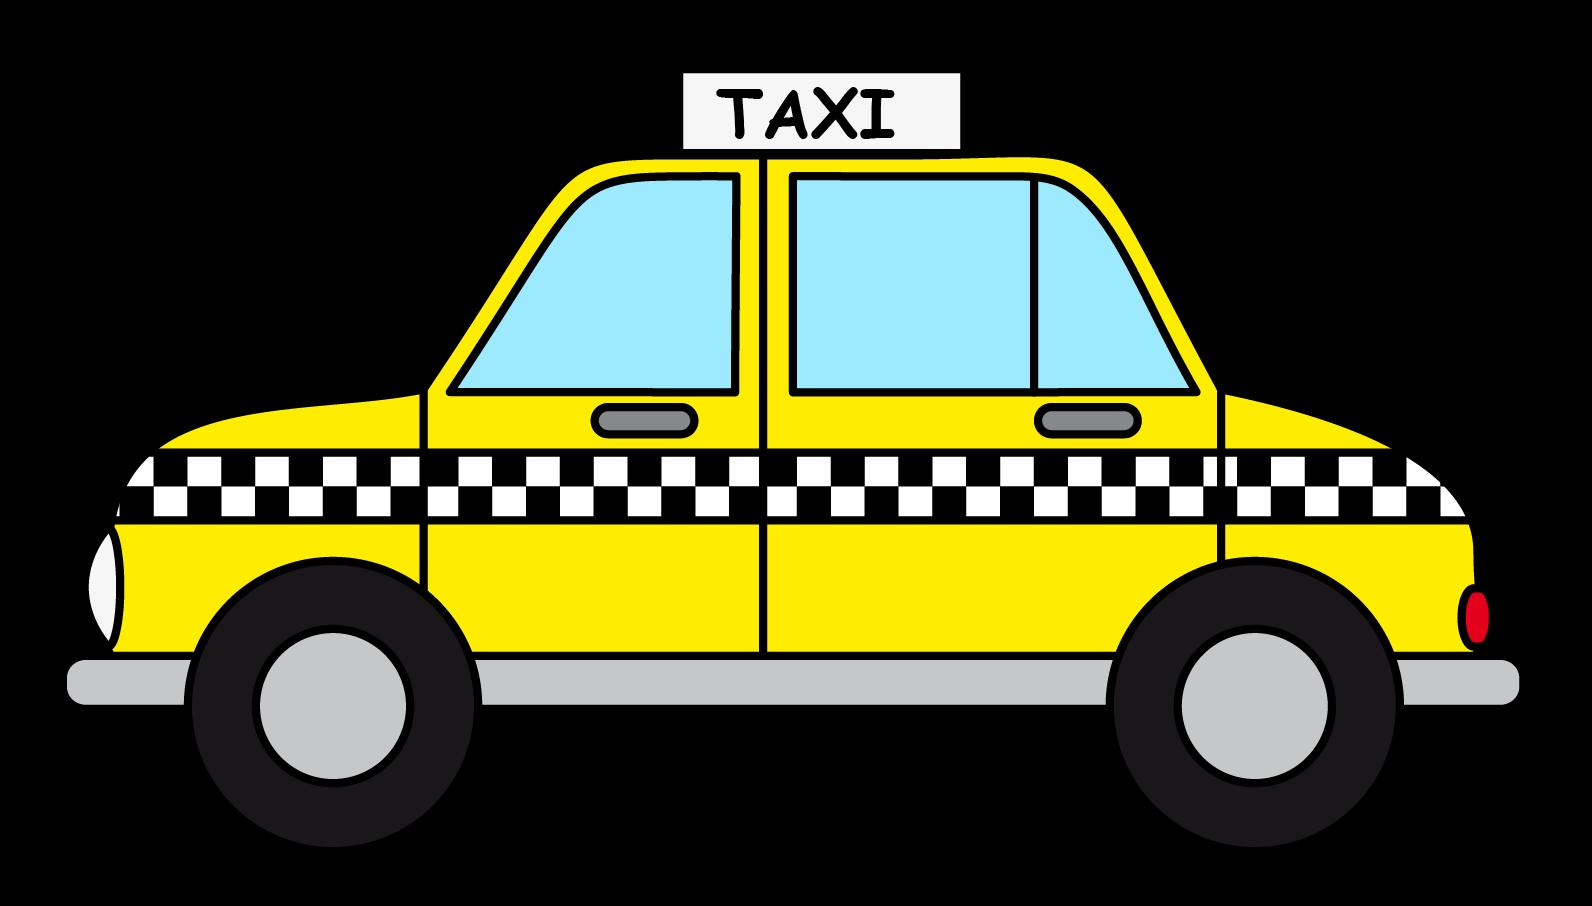 Cartoon car images free. Minivan clipart taxi bus